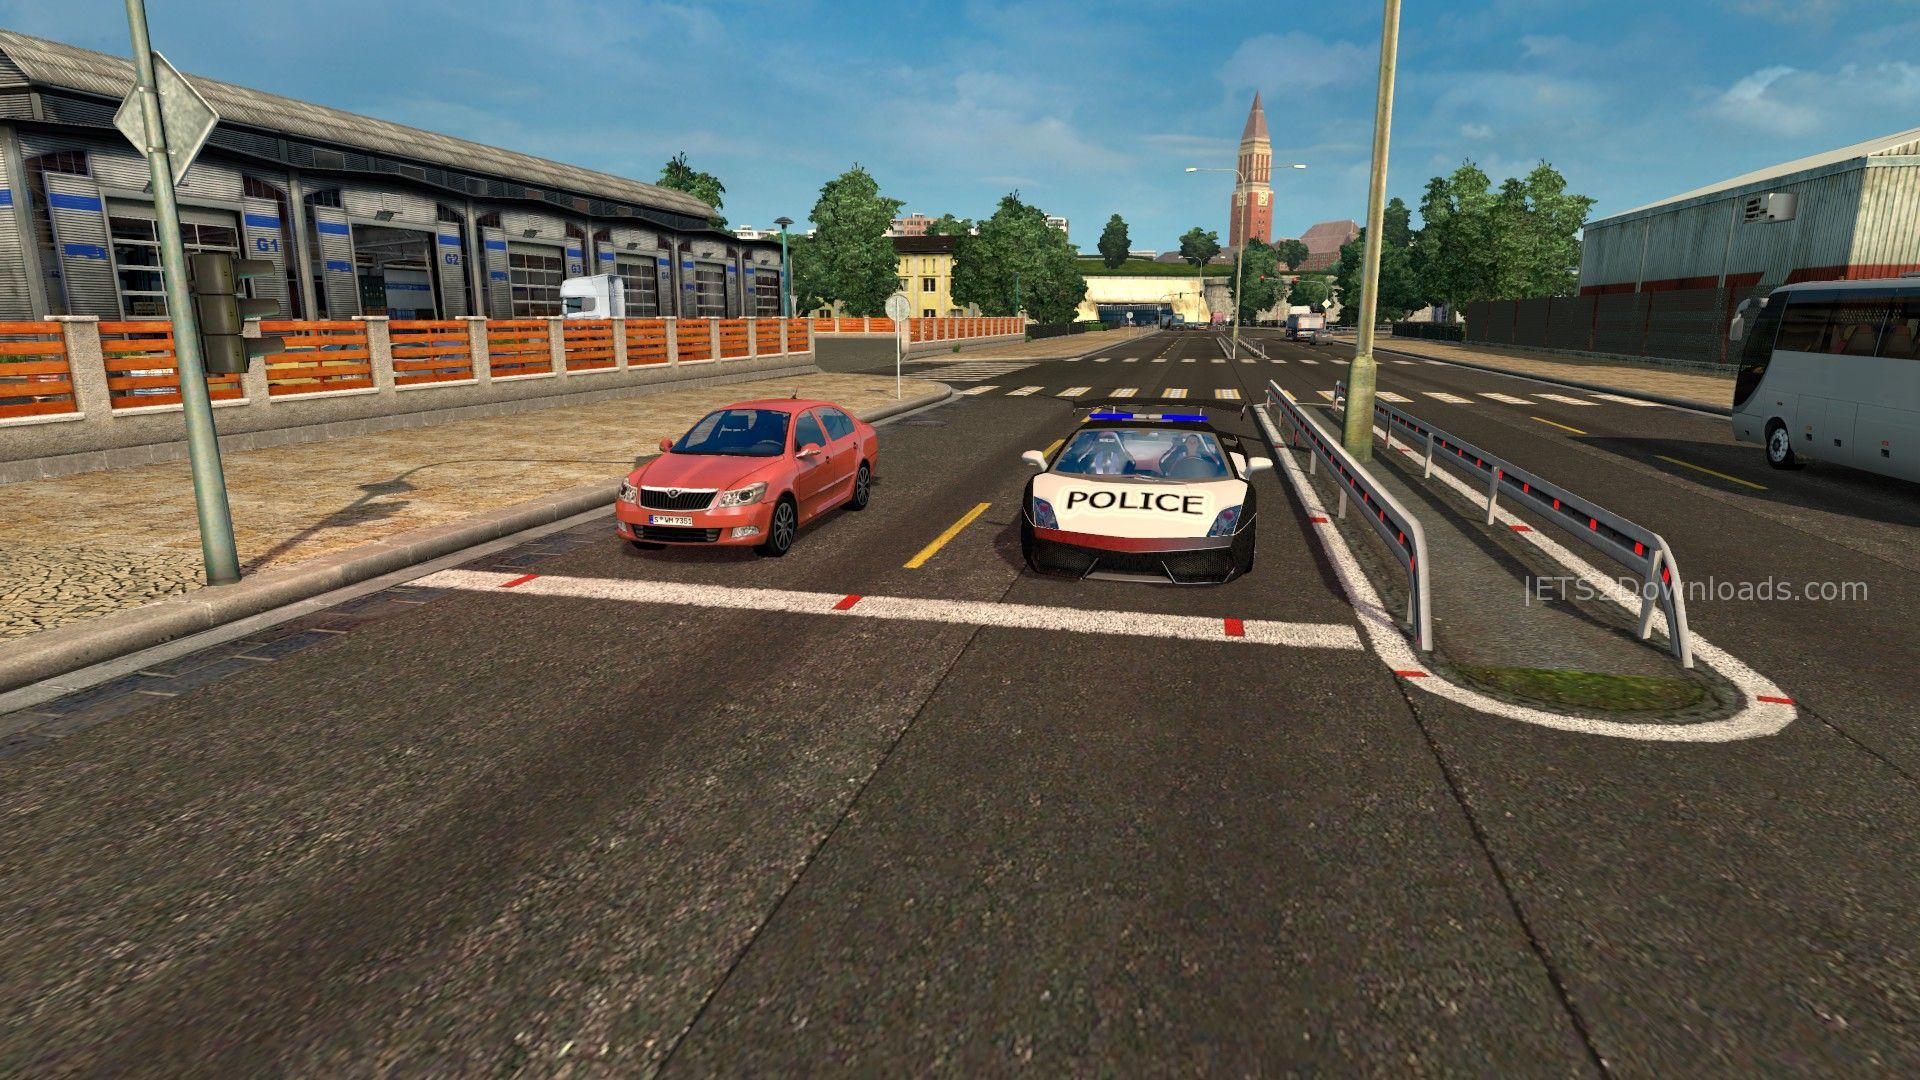 lamborghini-police-traffic-car